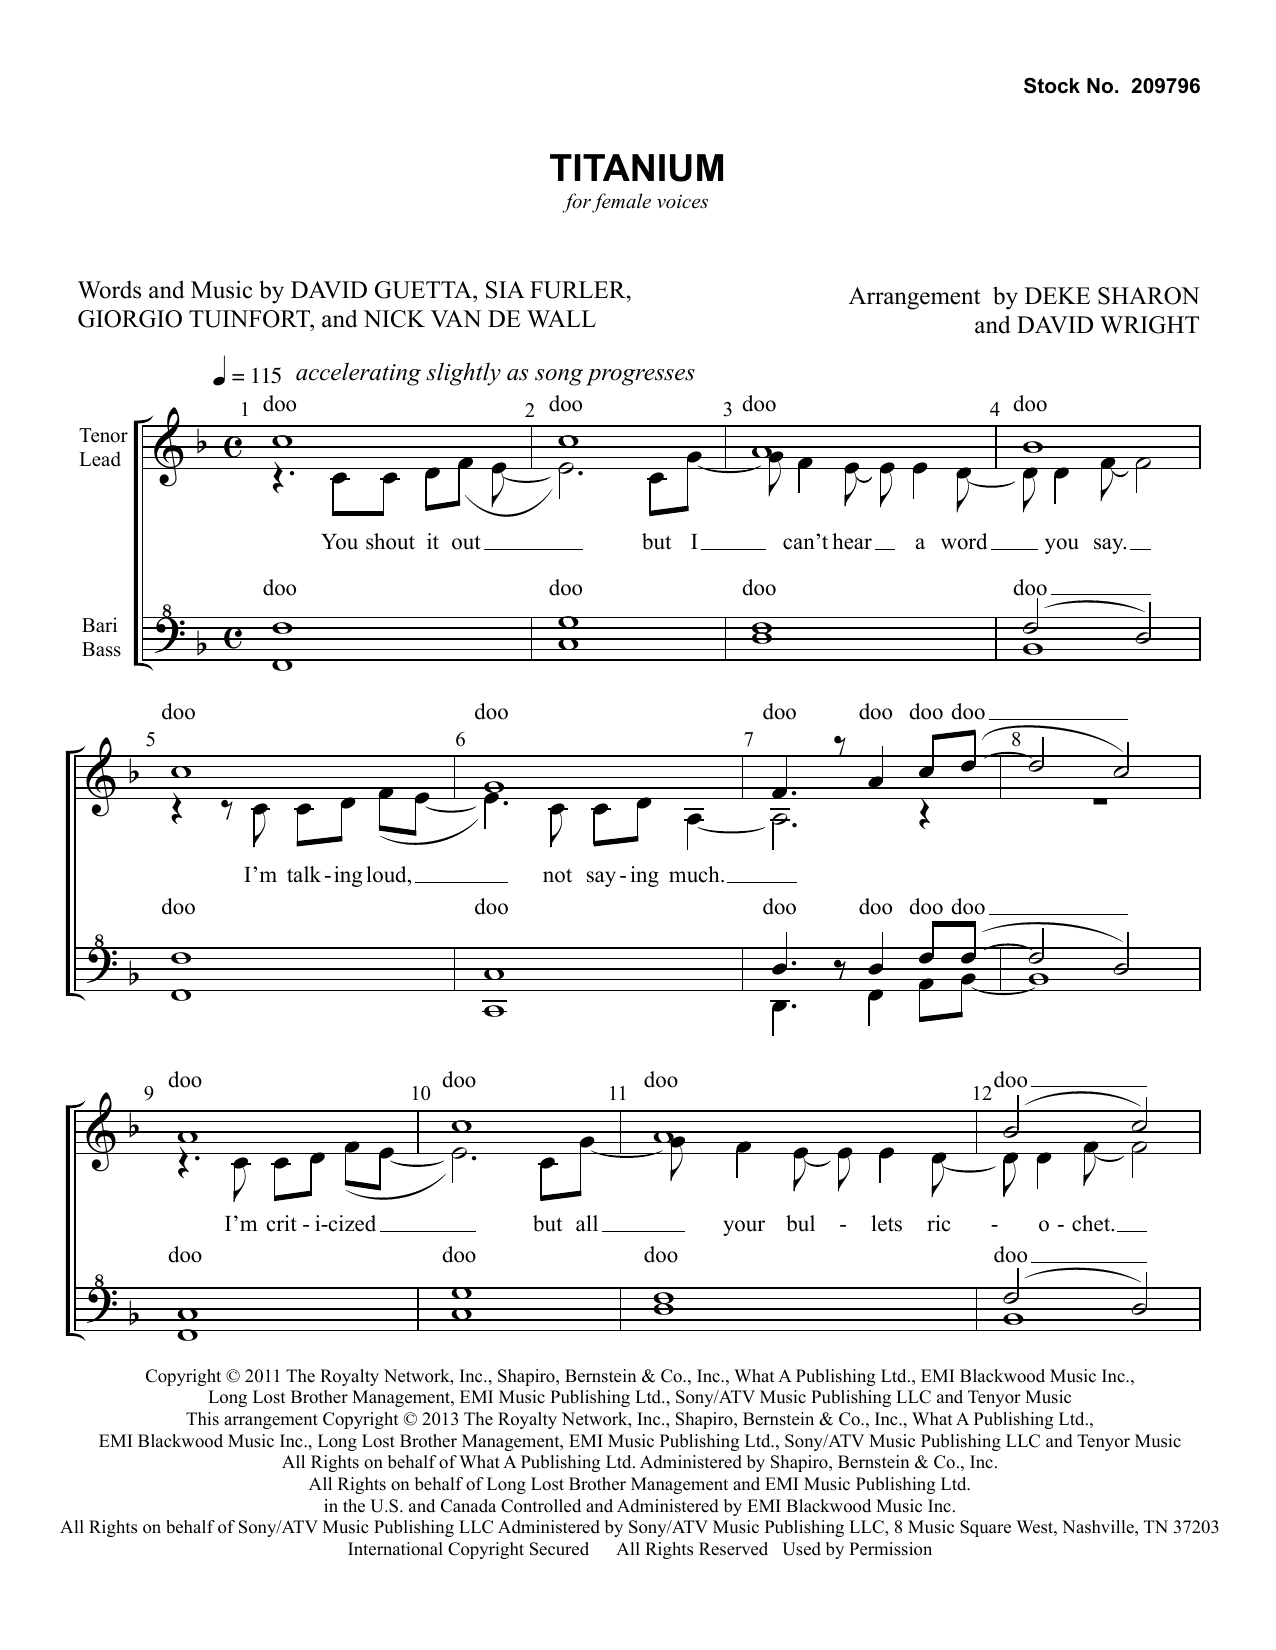 David Guetta Titanium (feat. Sia) (arr. Deke Sharon, David Wright) sheet music notes and chords. Download Printable PDF.